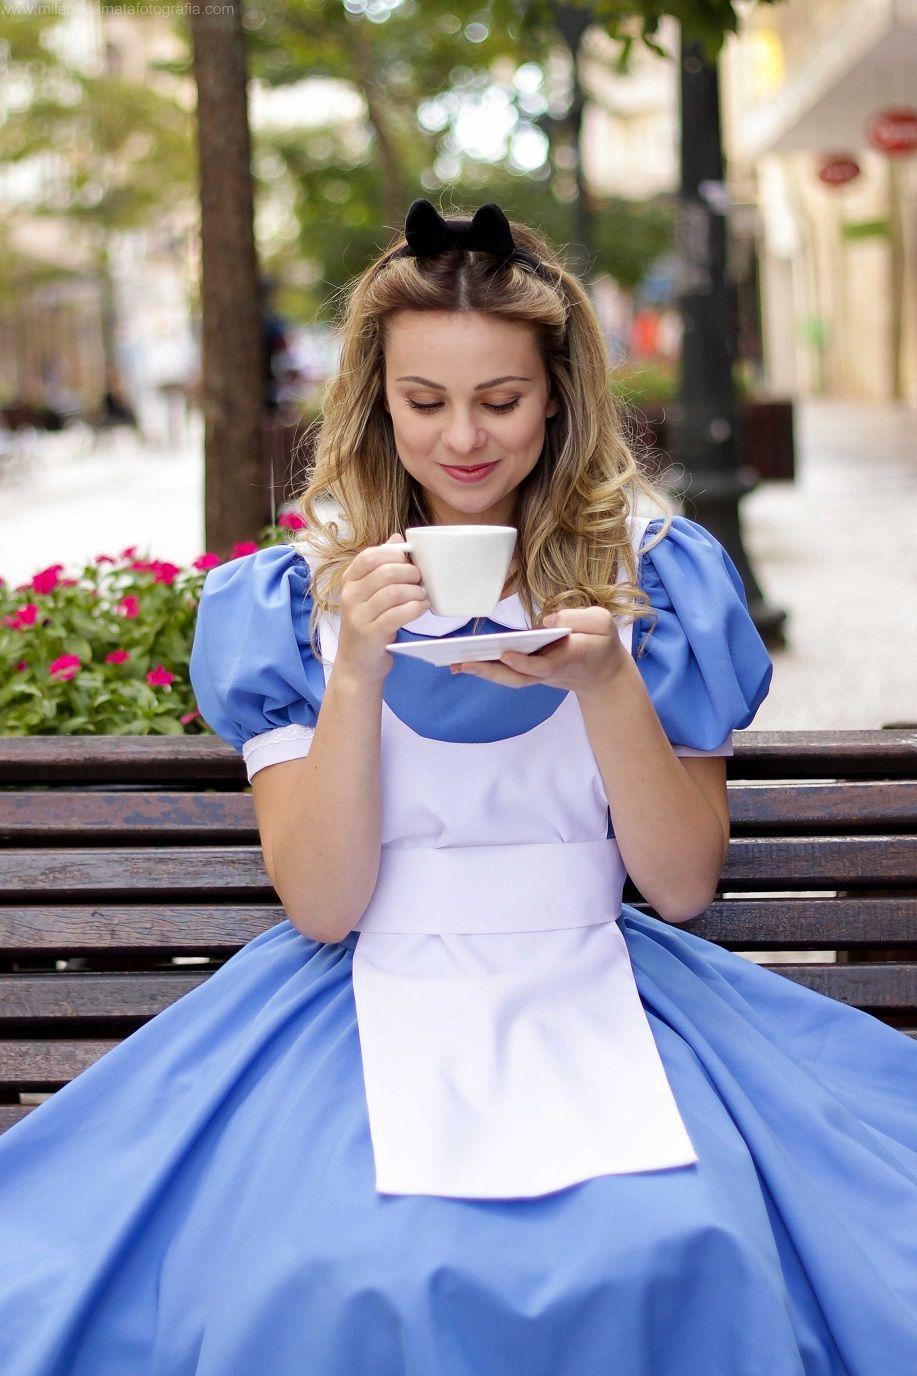 Alice Curitiba Milenedamata 2 Alice Alice No Pais Das